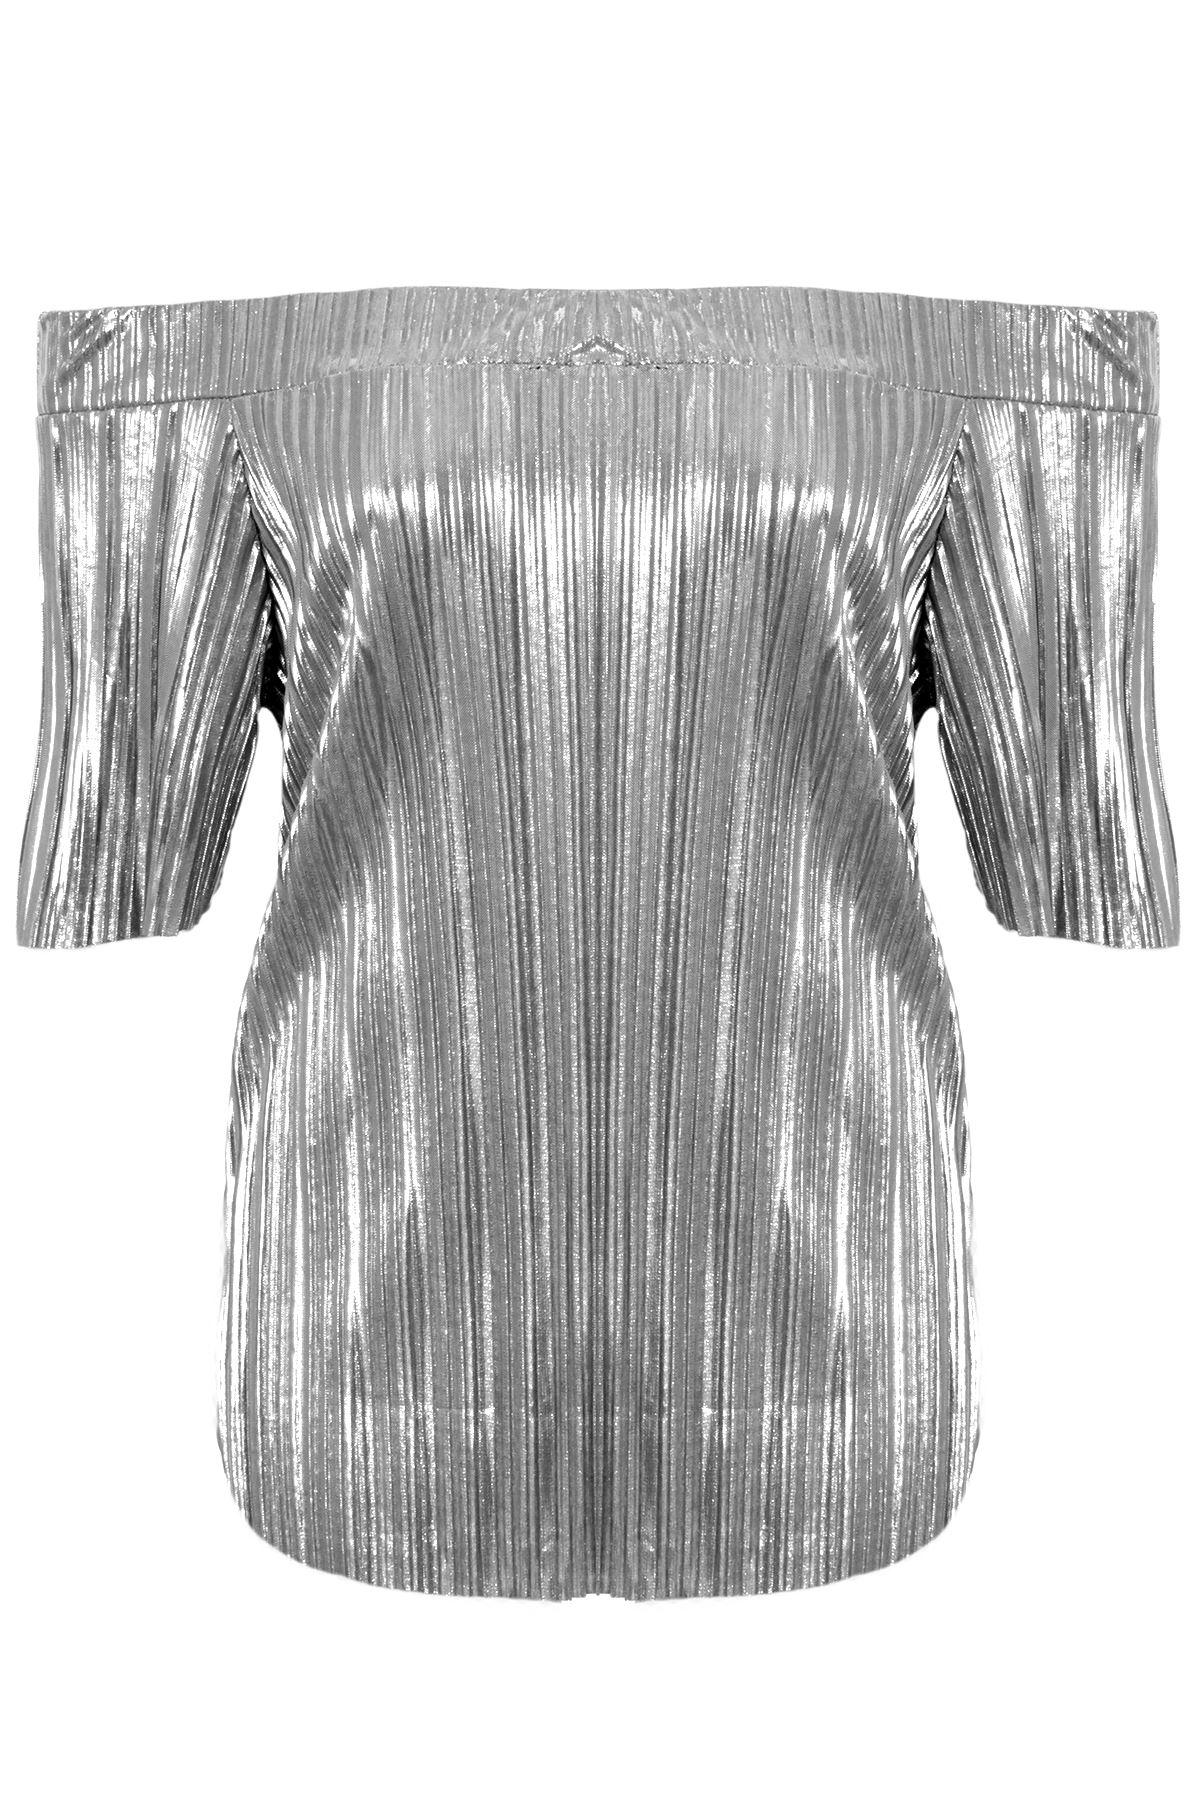 111cc91f2af Ladies Short Sleeve Bardot Off Shoulder Pleated Foil Metallic Stretch Party  Top | eBay